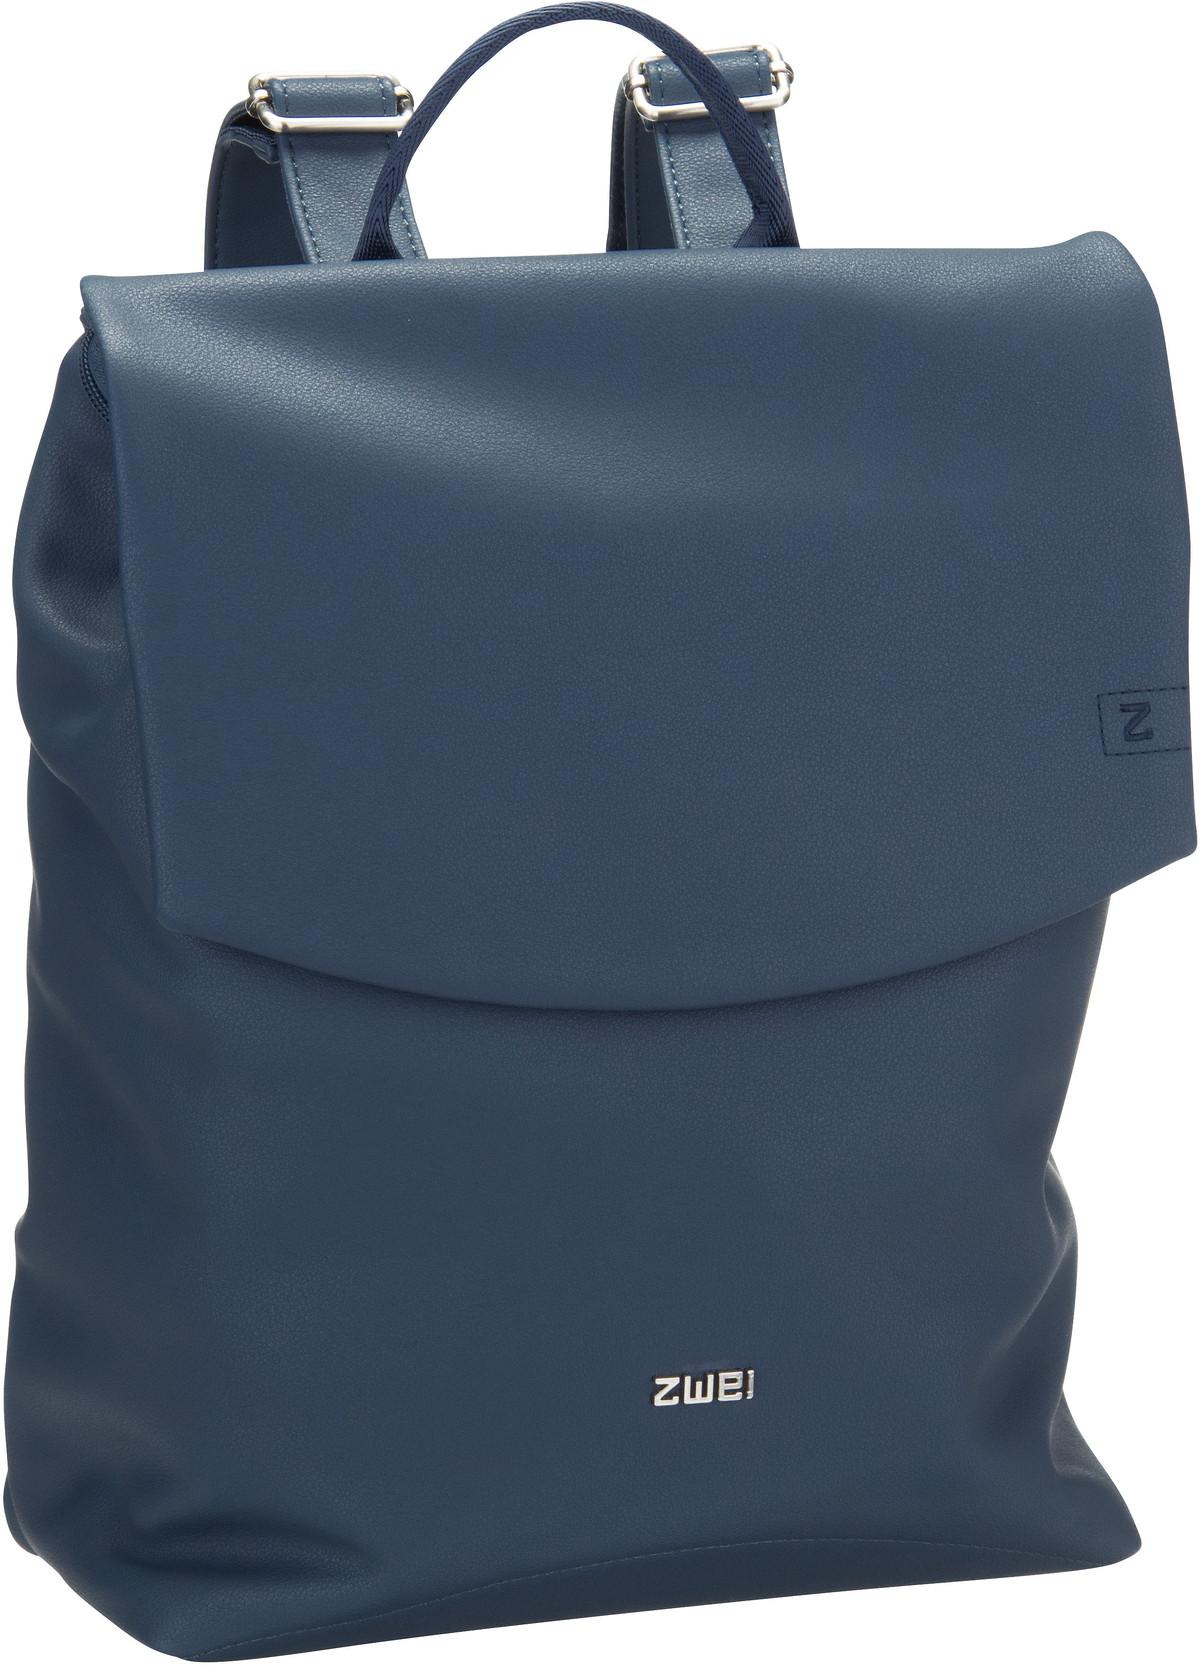 Rucksack / Daypack Elli ELR13 Blue (8 Liter)